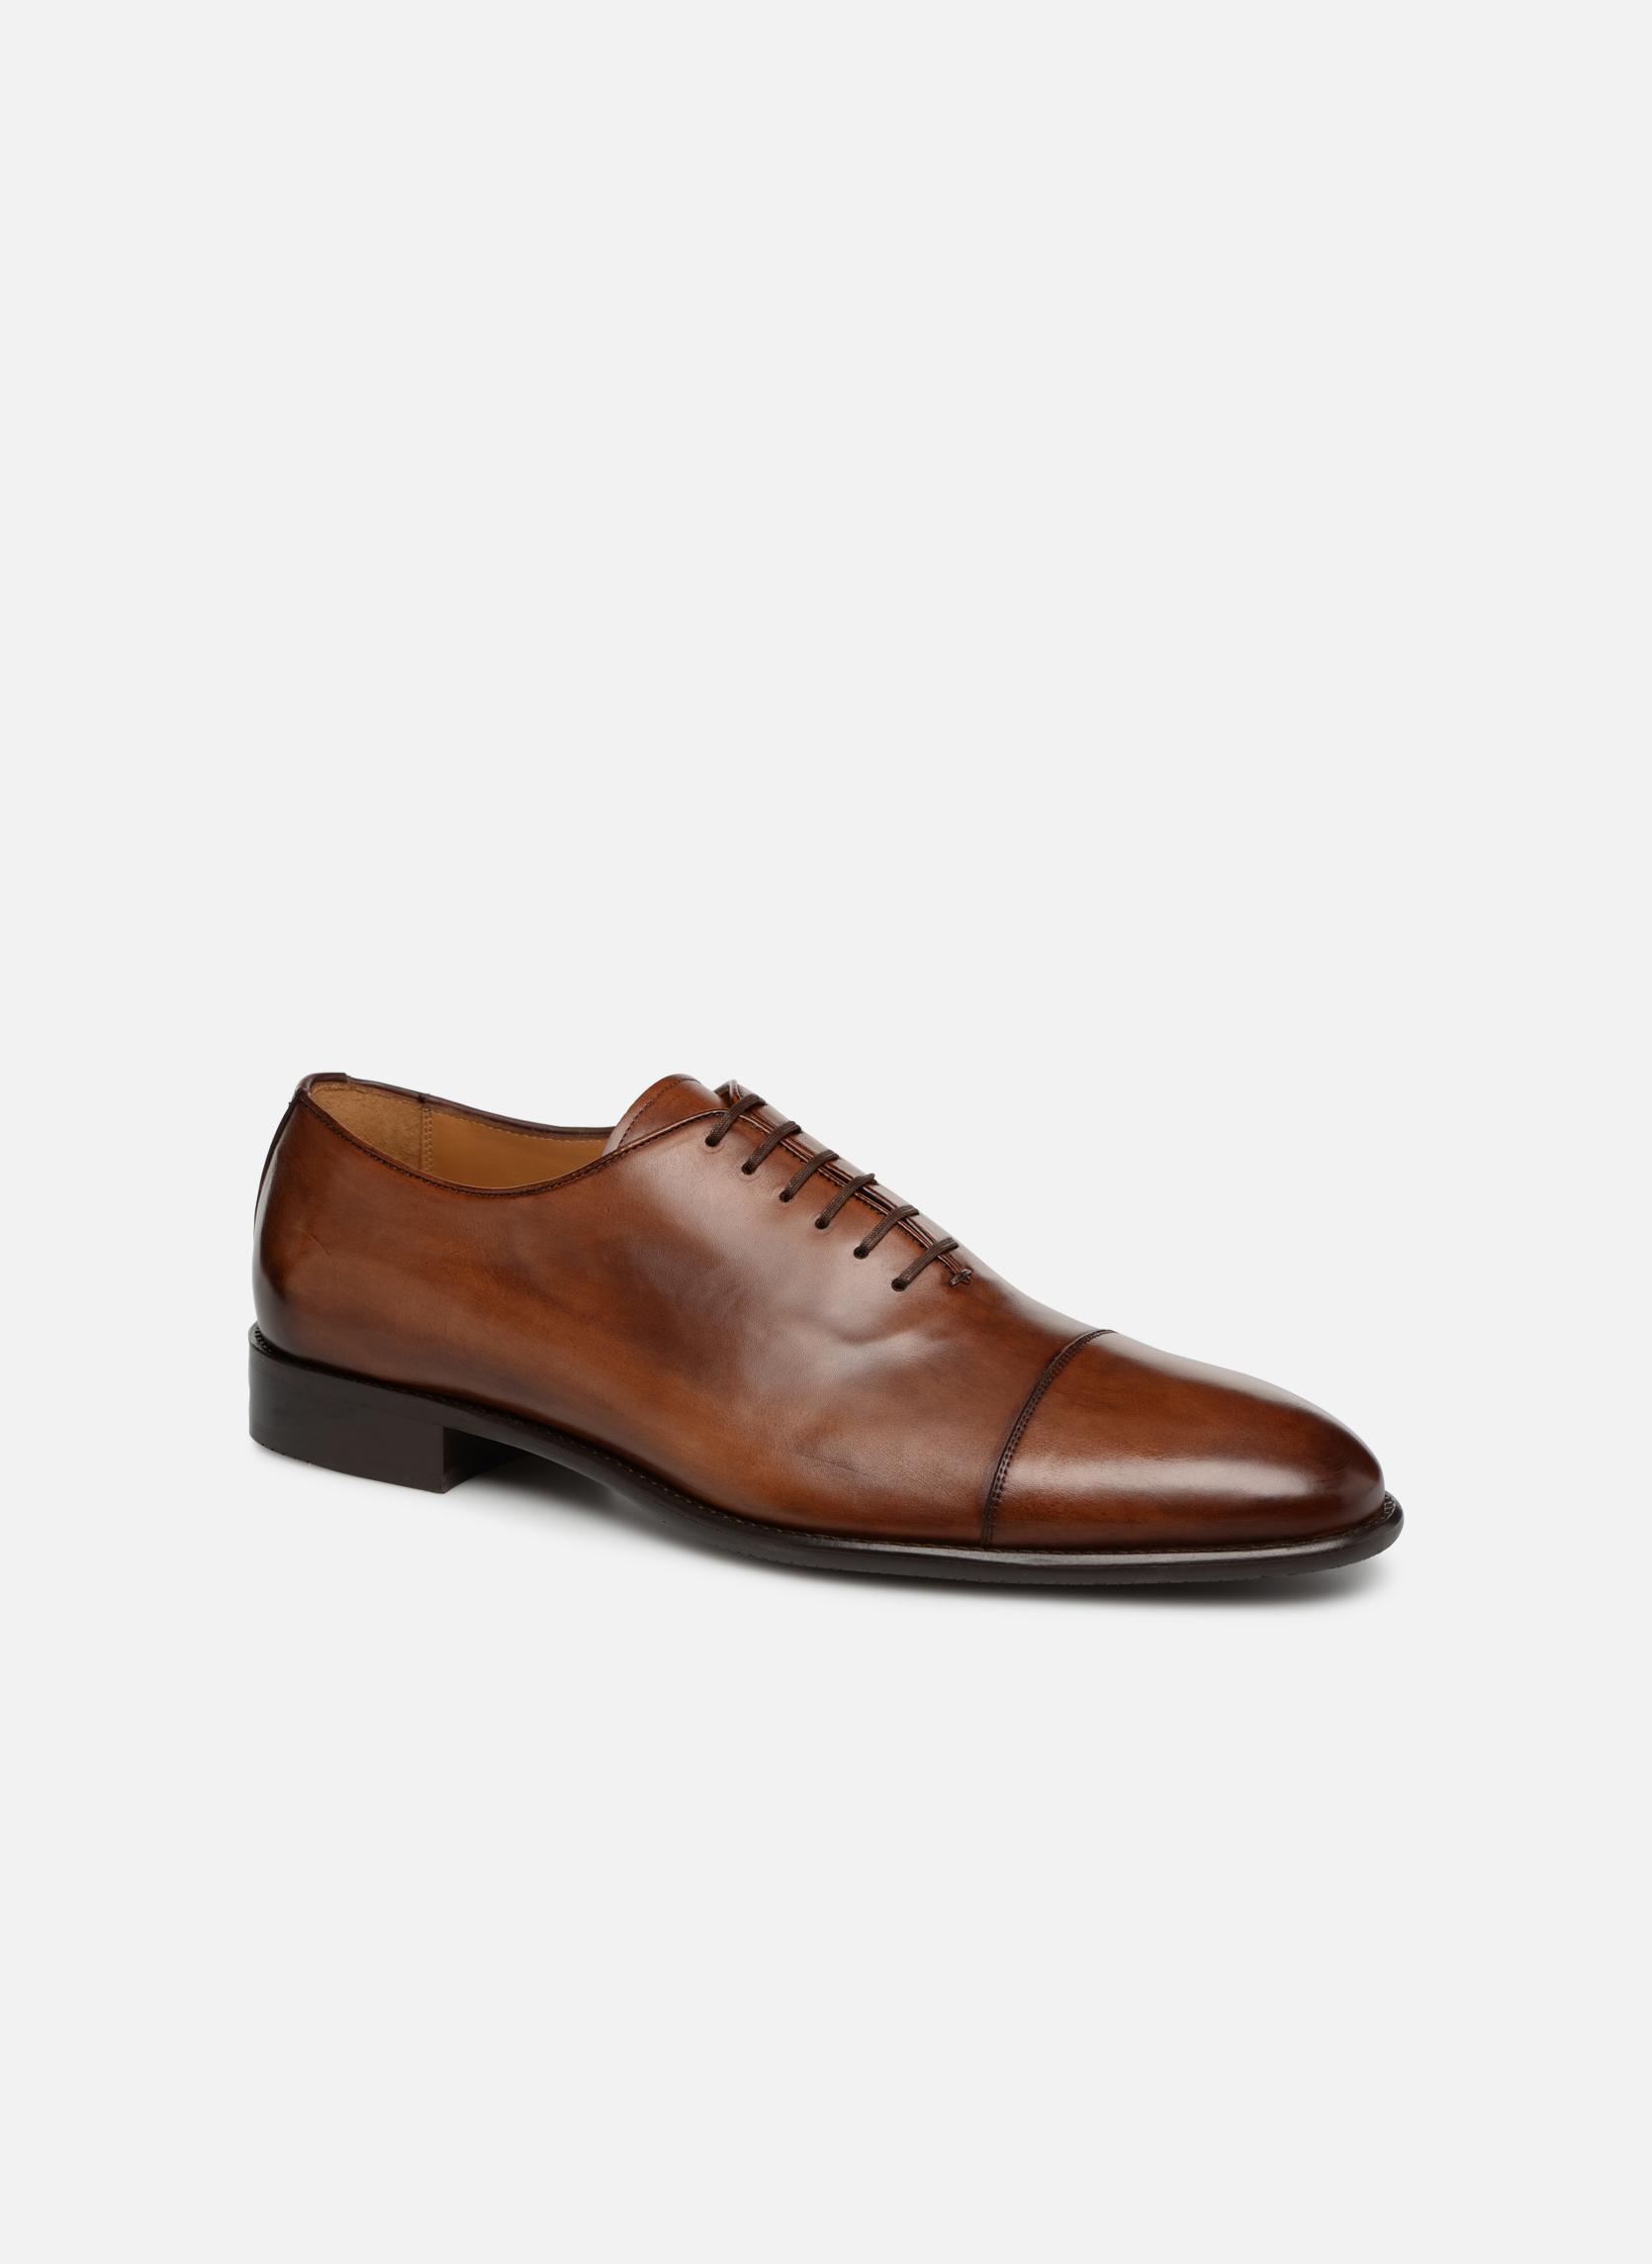 Zapatos con cordones Hombre Perchok